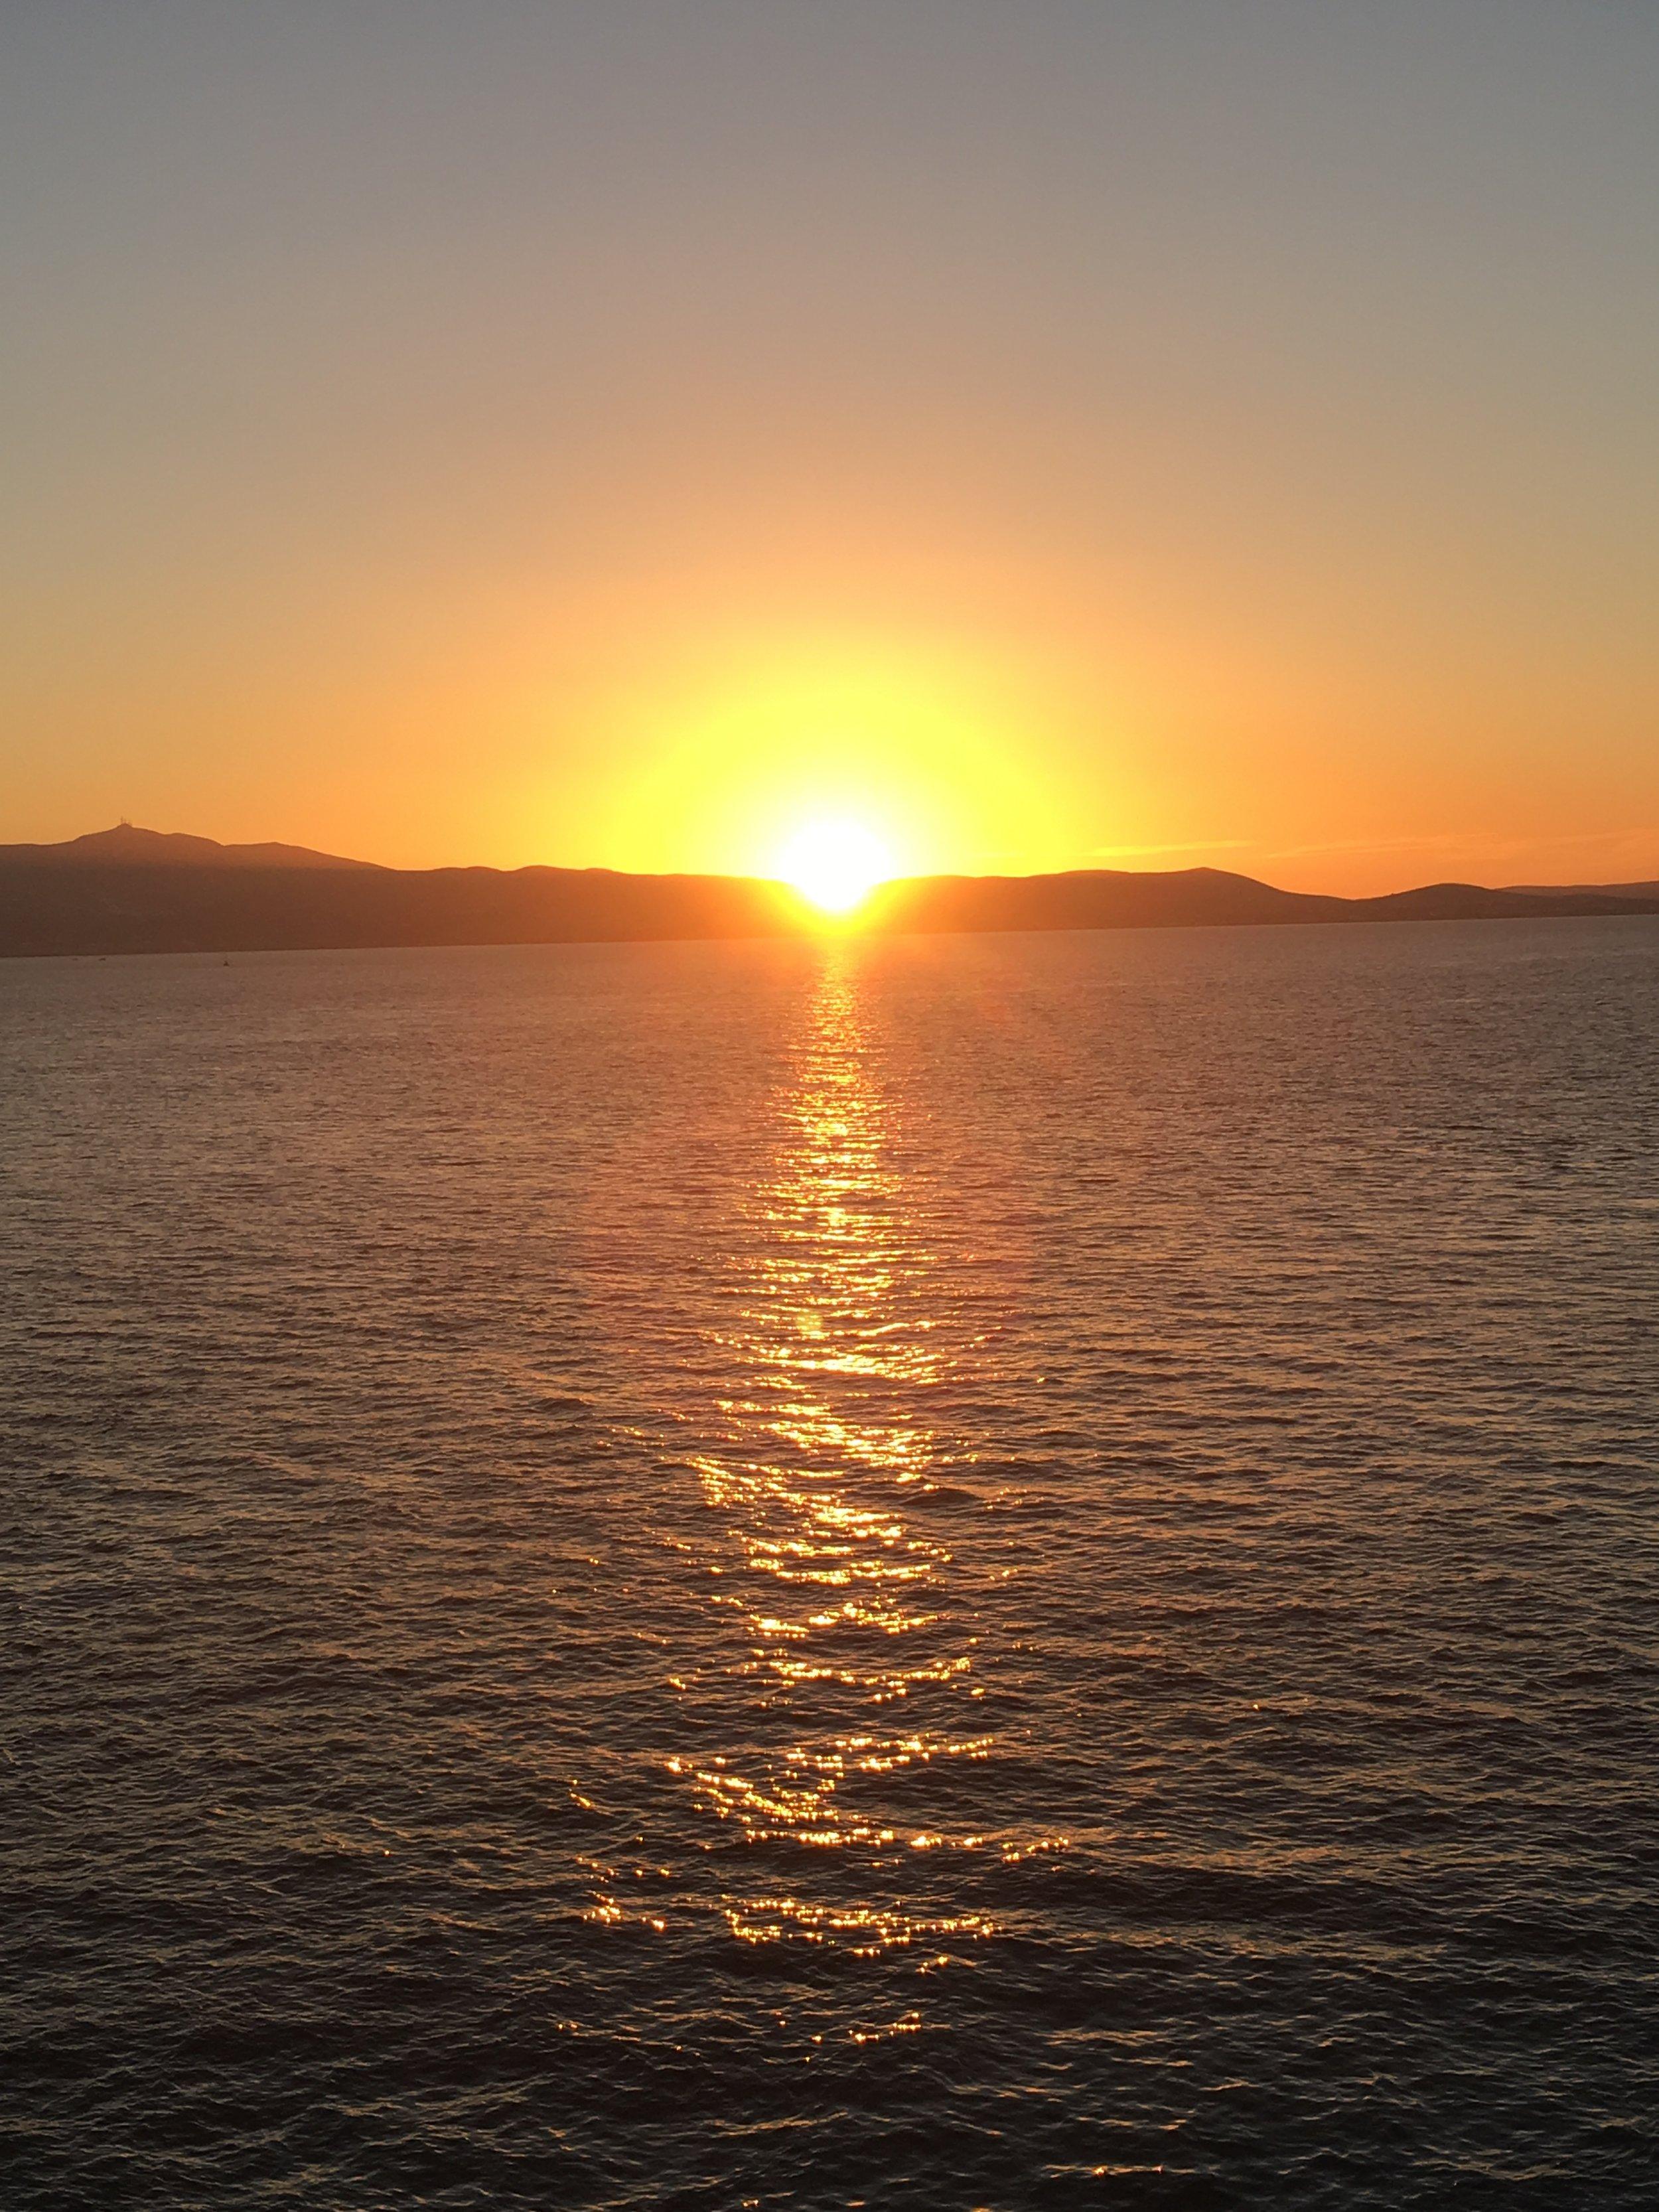 One last island sunset